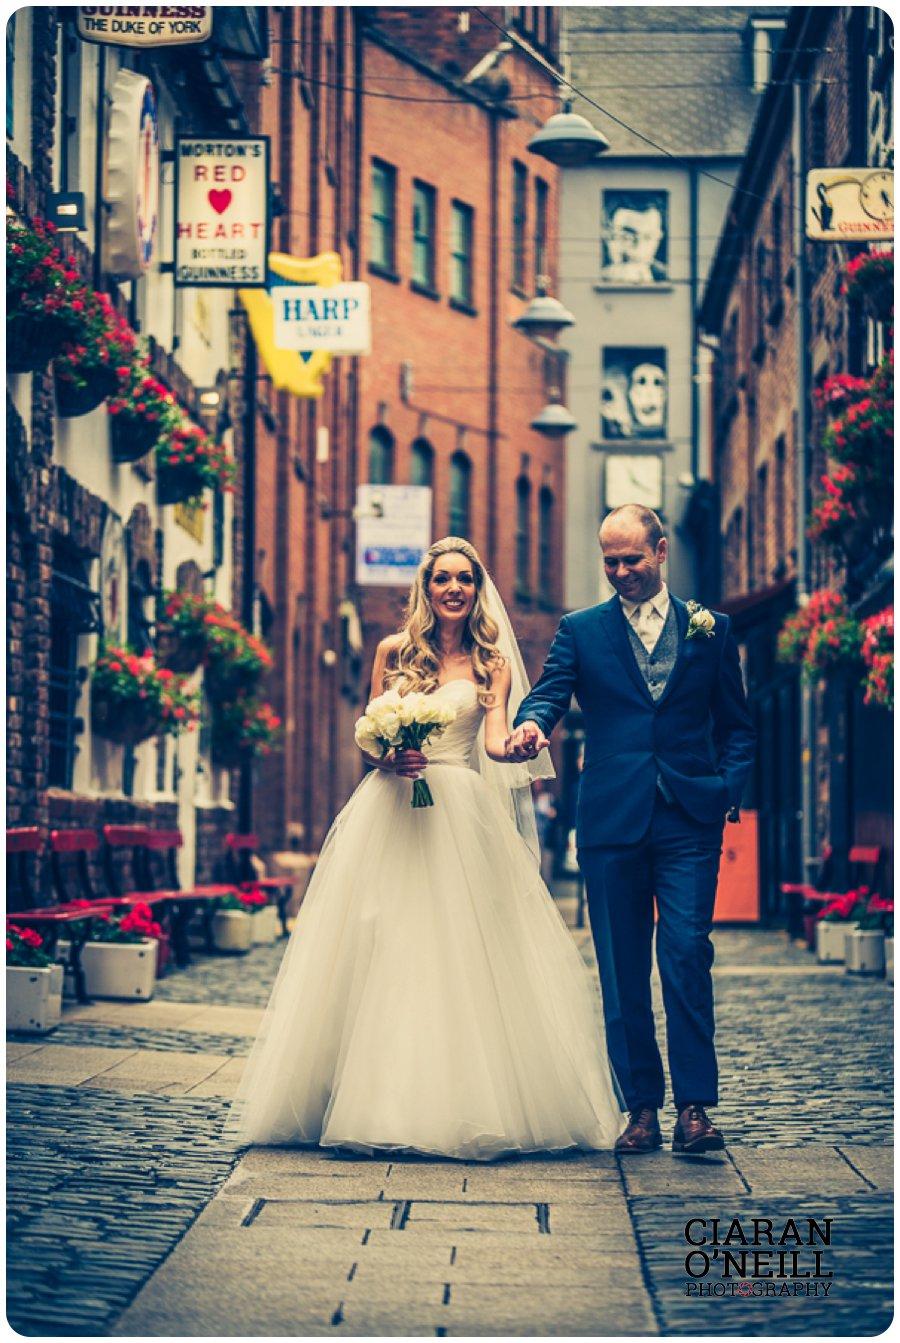 Linda & Jae's wedding at the Merchant Hotel by Ciaran O'Neill Photography 13